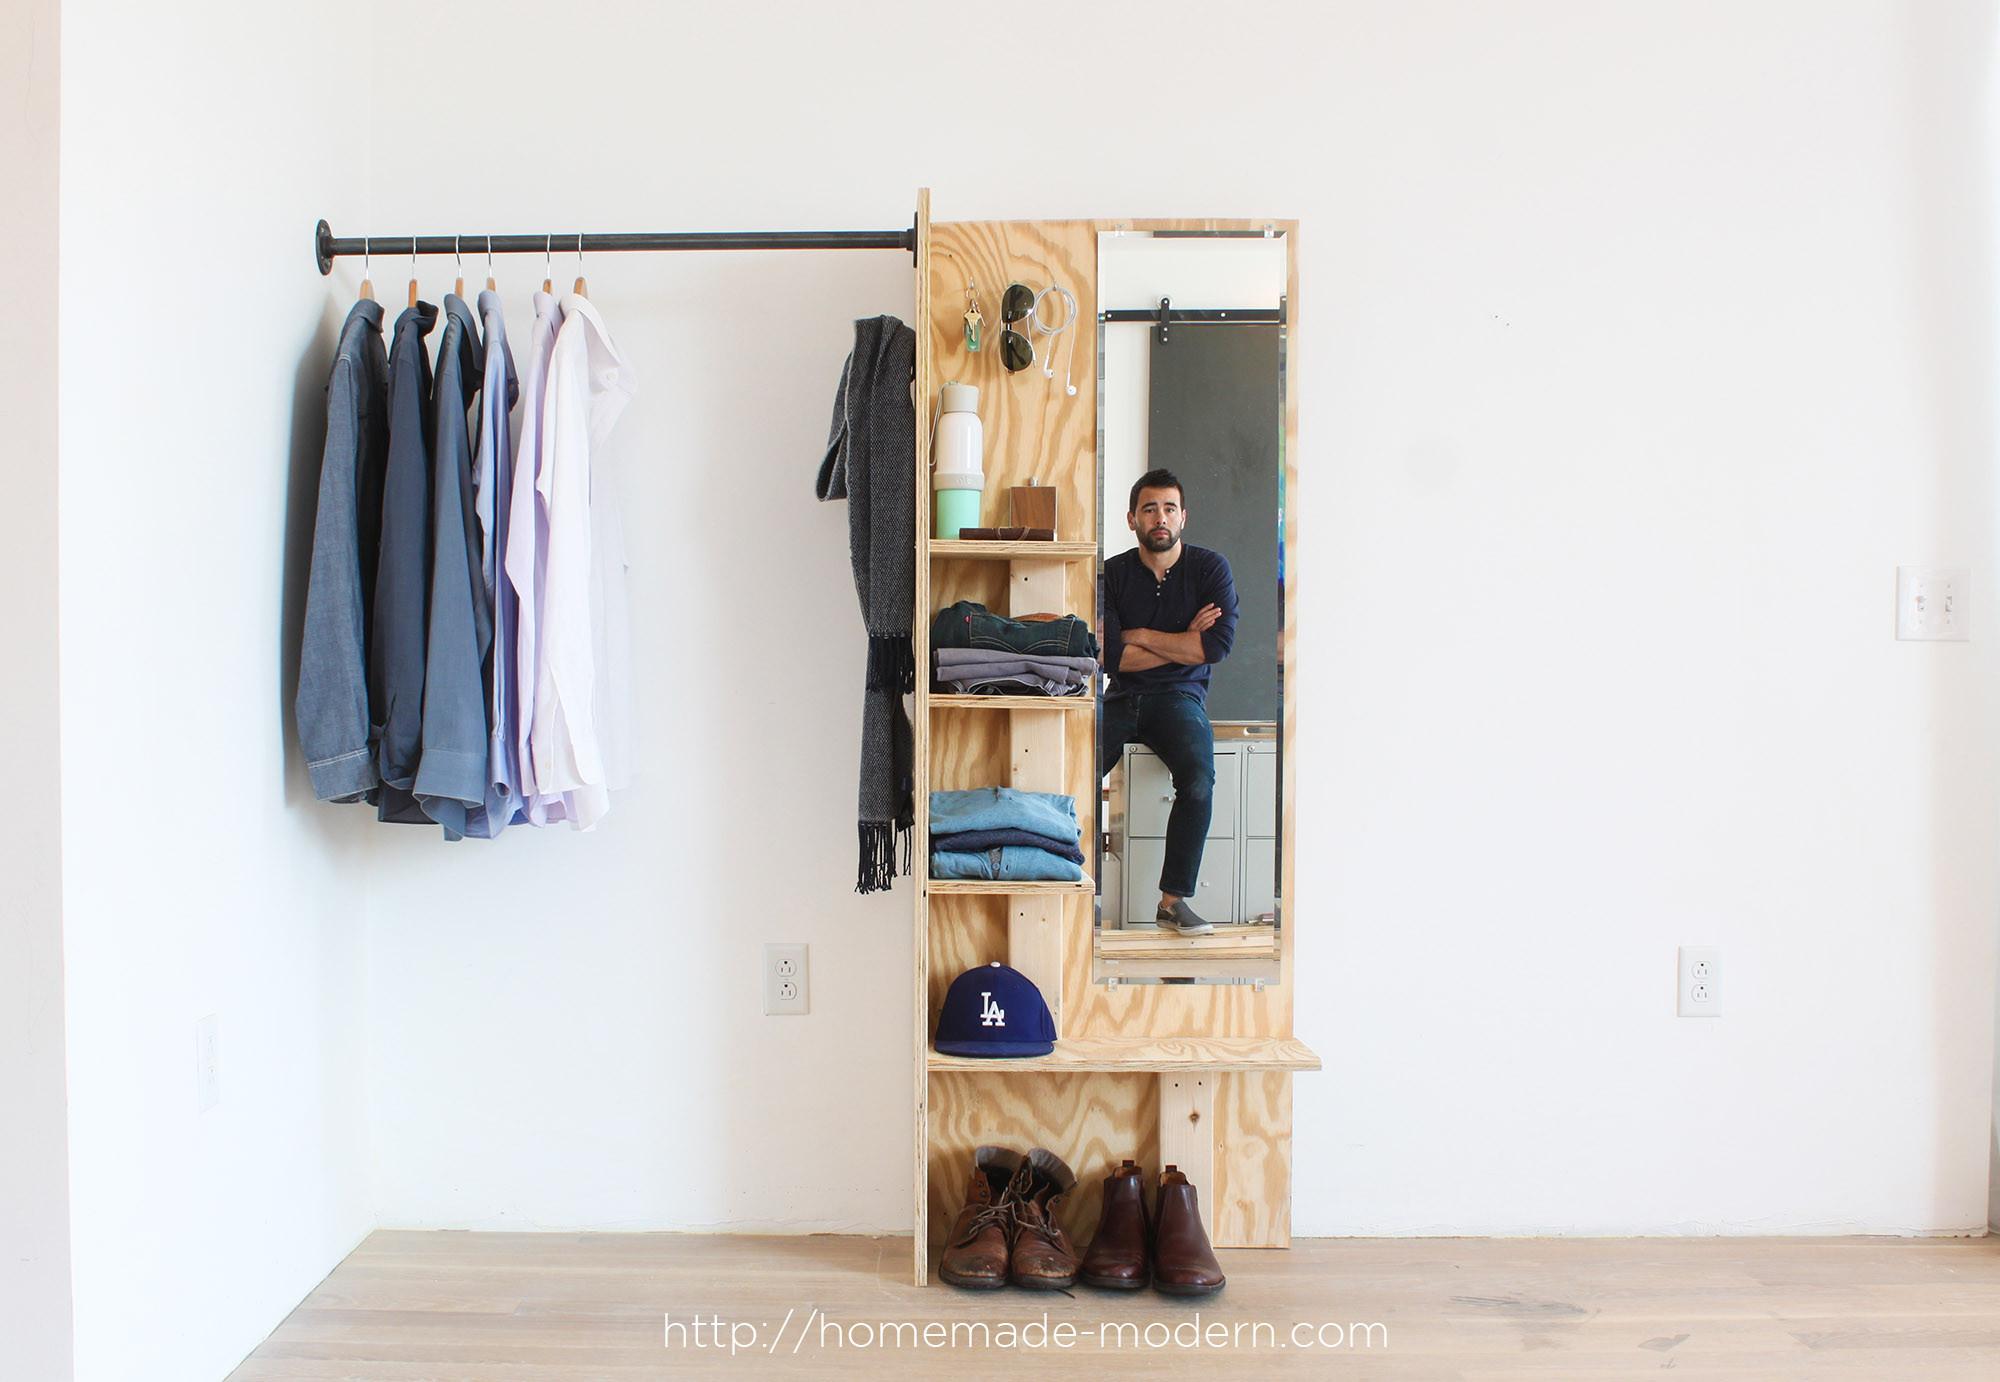 Best ideas about DIY Closet Rack . Save or Pin HomeMade Modern EP98 DIY Closet Organizer Now.